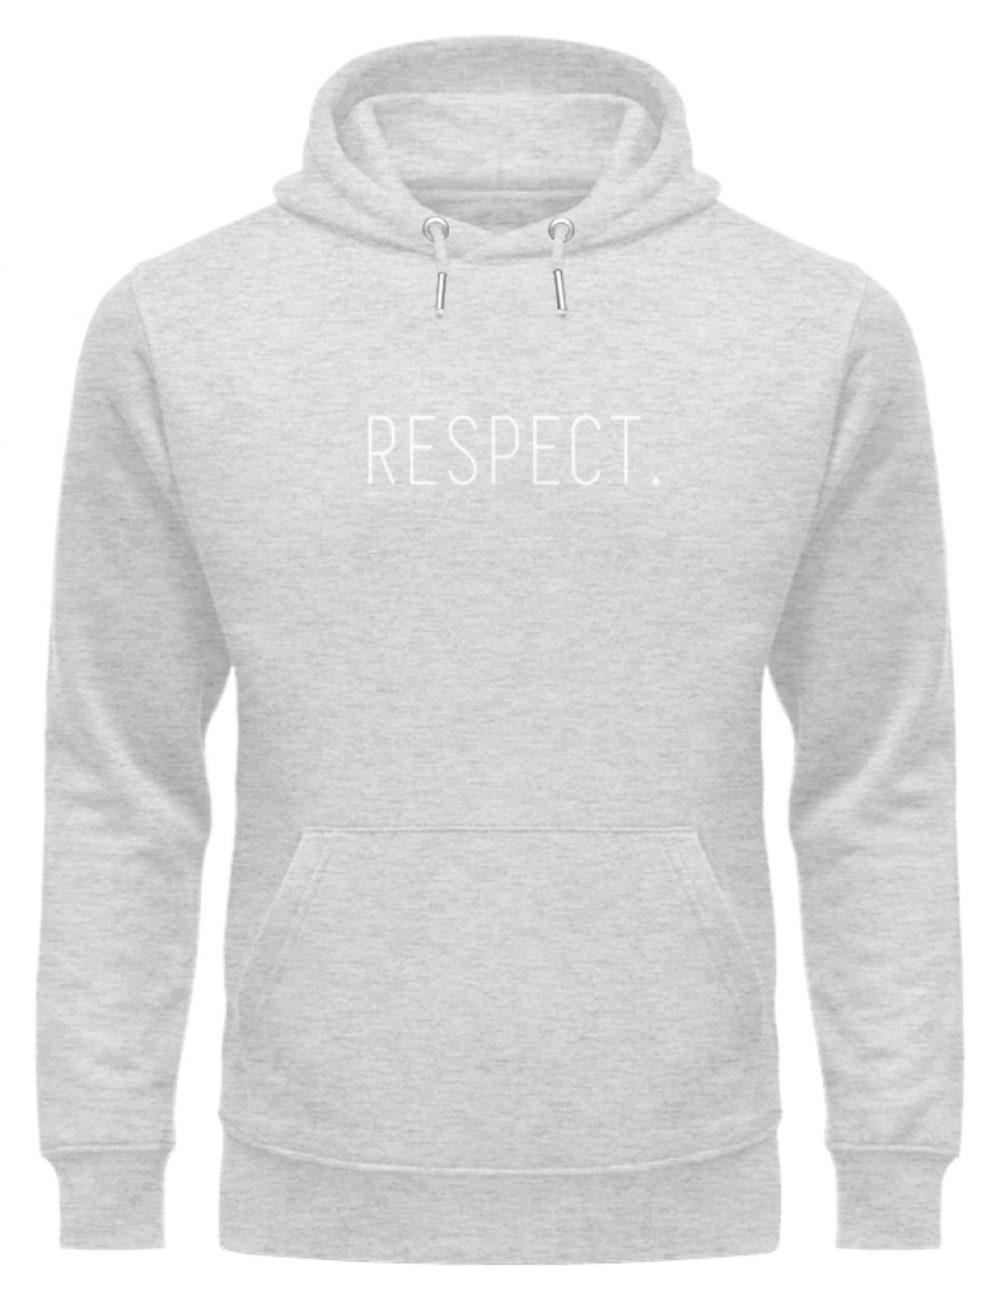 RESPECT. - Unisex Organic Hoodie-6892